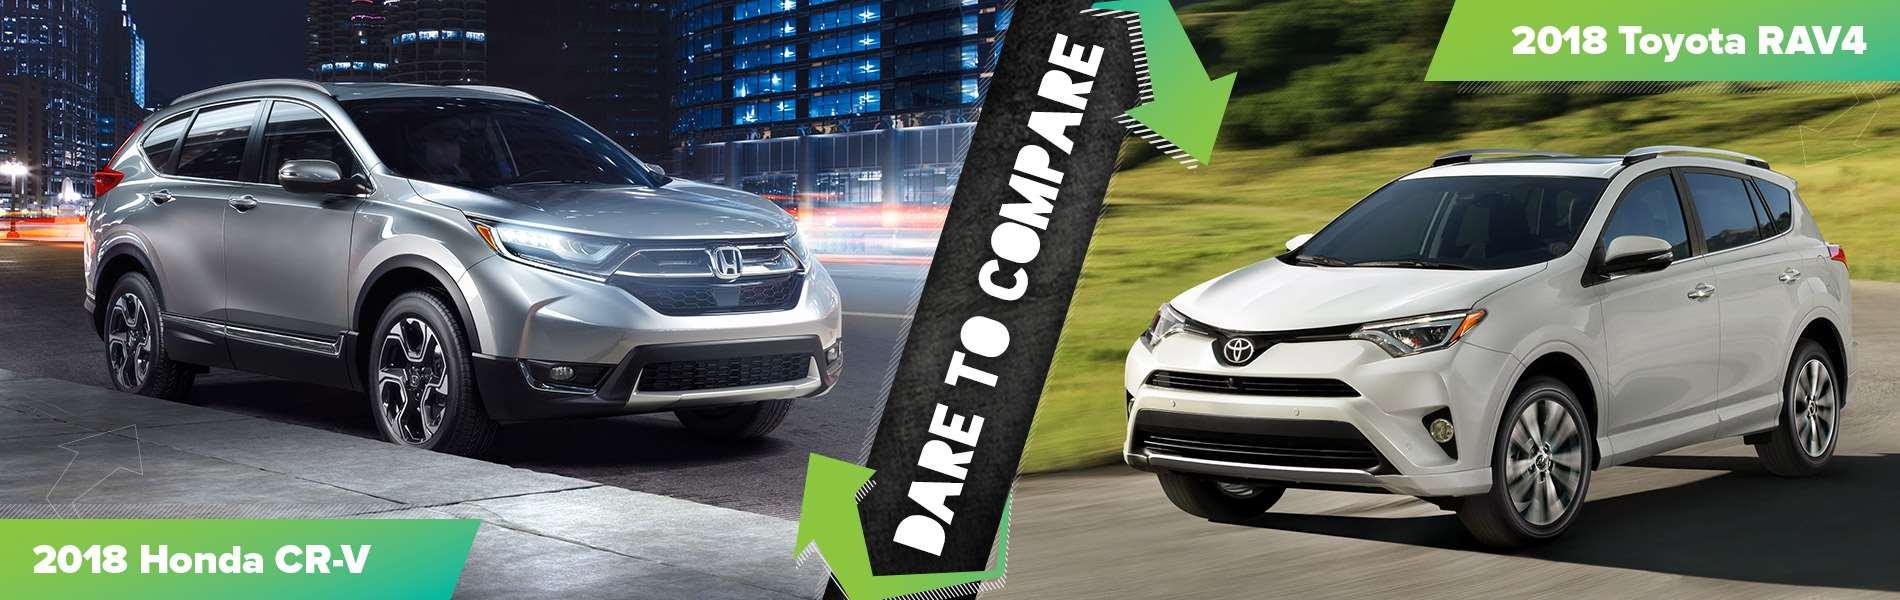 2018 Honda CR-V vs. 2018 Toyota RAV4